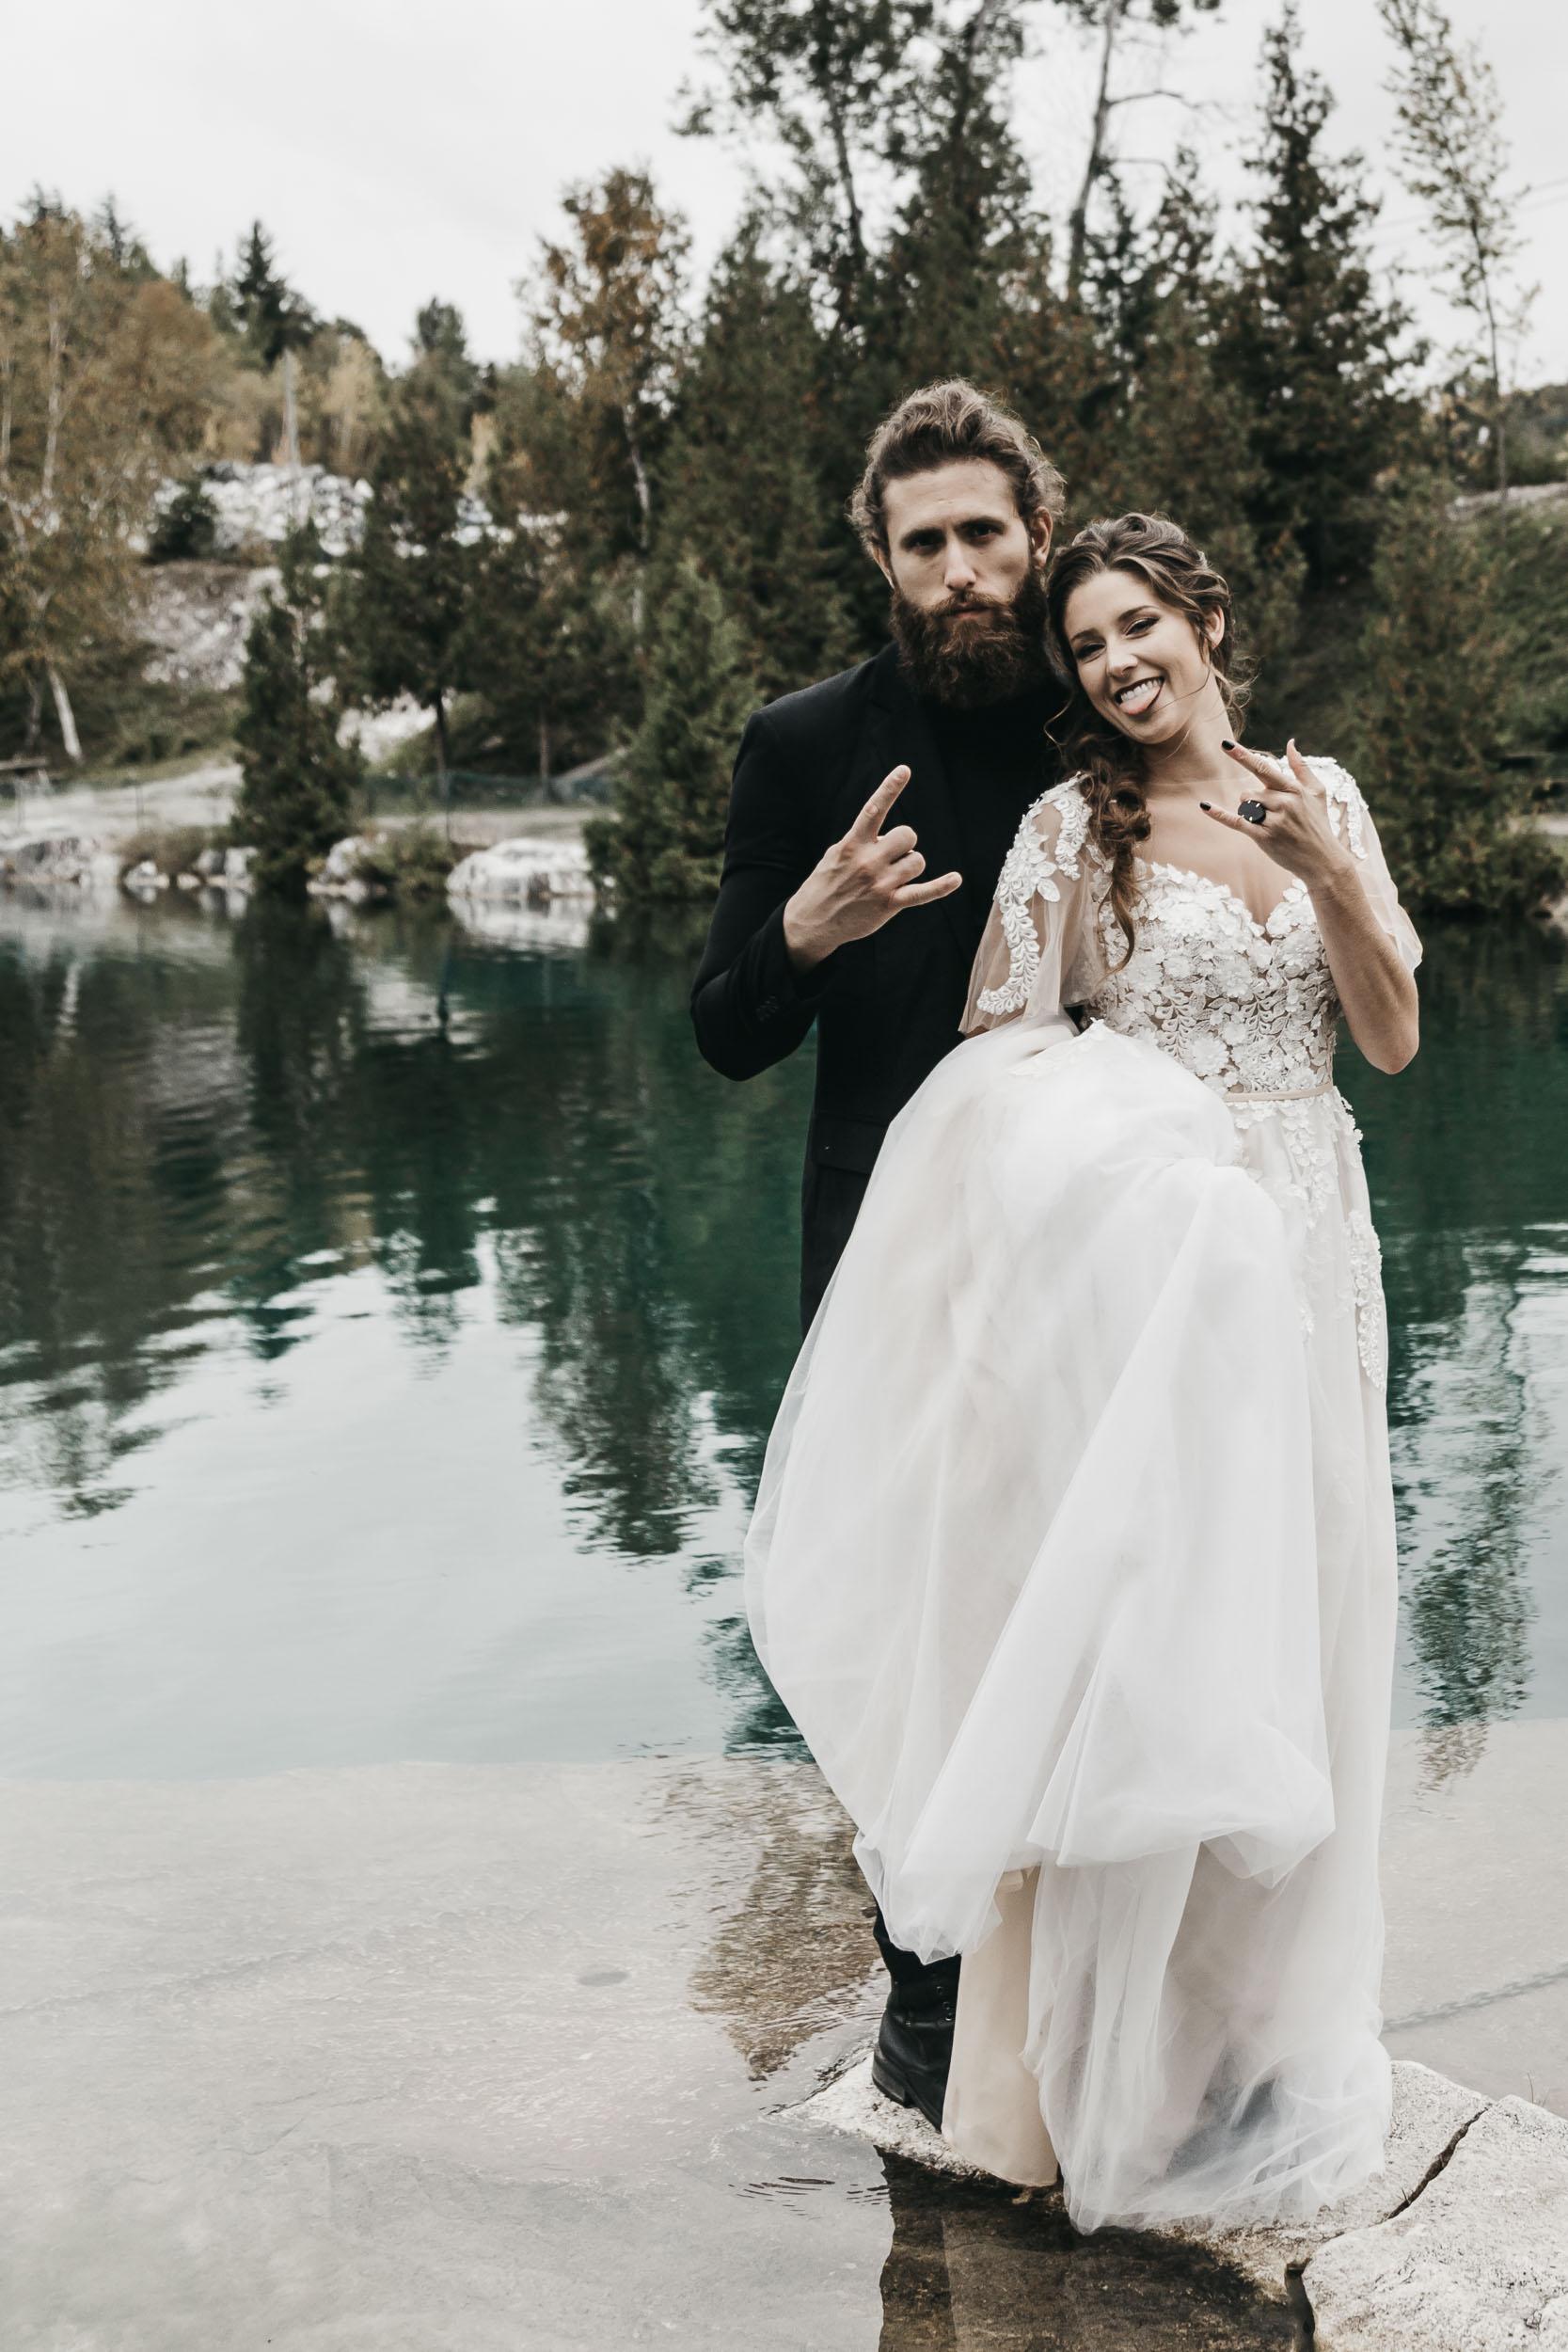 intimate-wedding-elopement-photographer-ottawa-toronto-0388.jpg